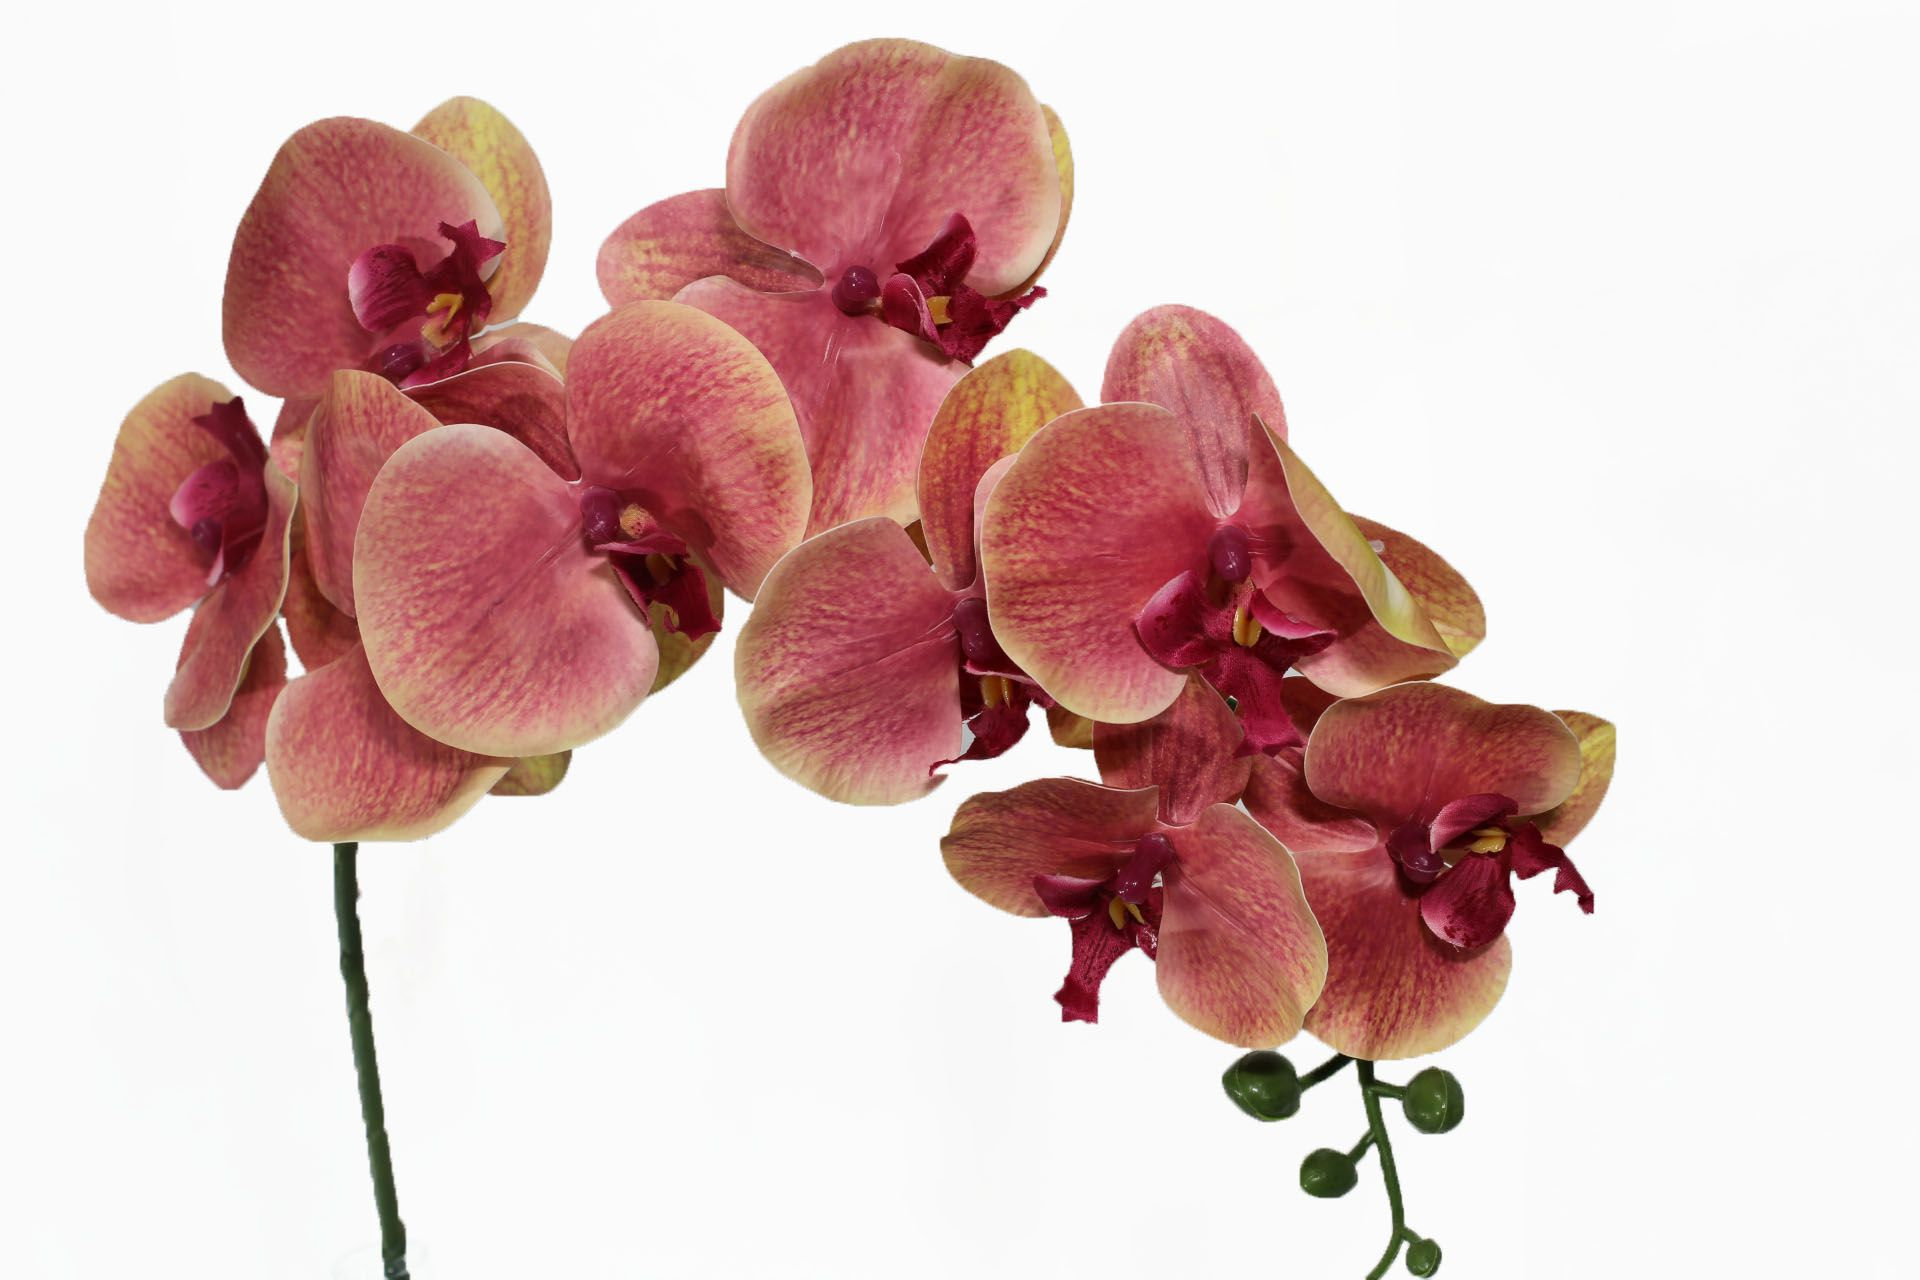 Flor de orquídea X6 - Pano - 75cm